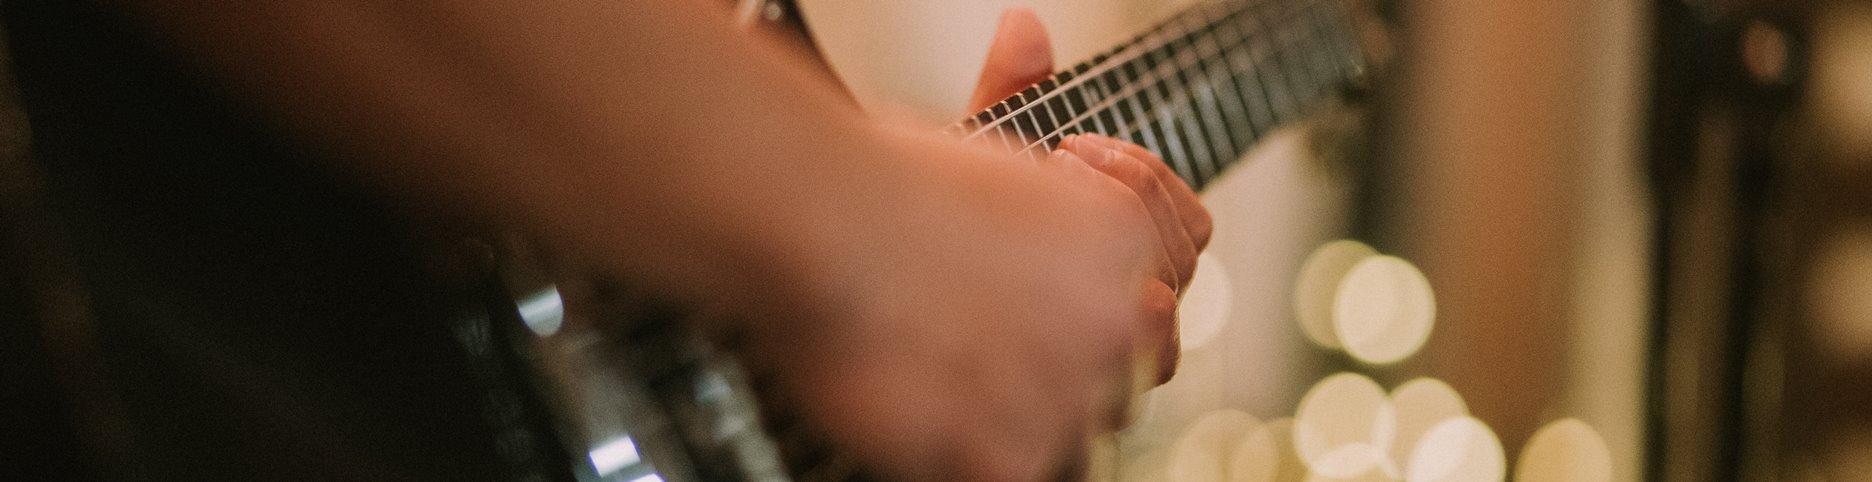 Hands strumming a guitar, cropped photo byAmy VelazquezonUnsplash